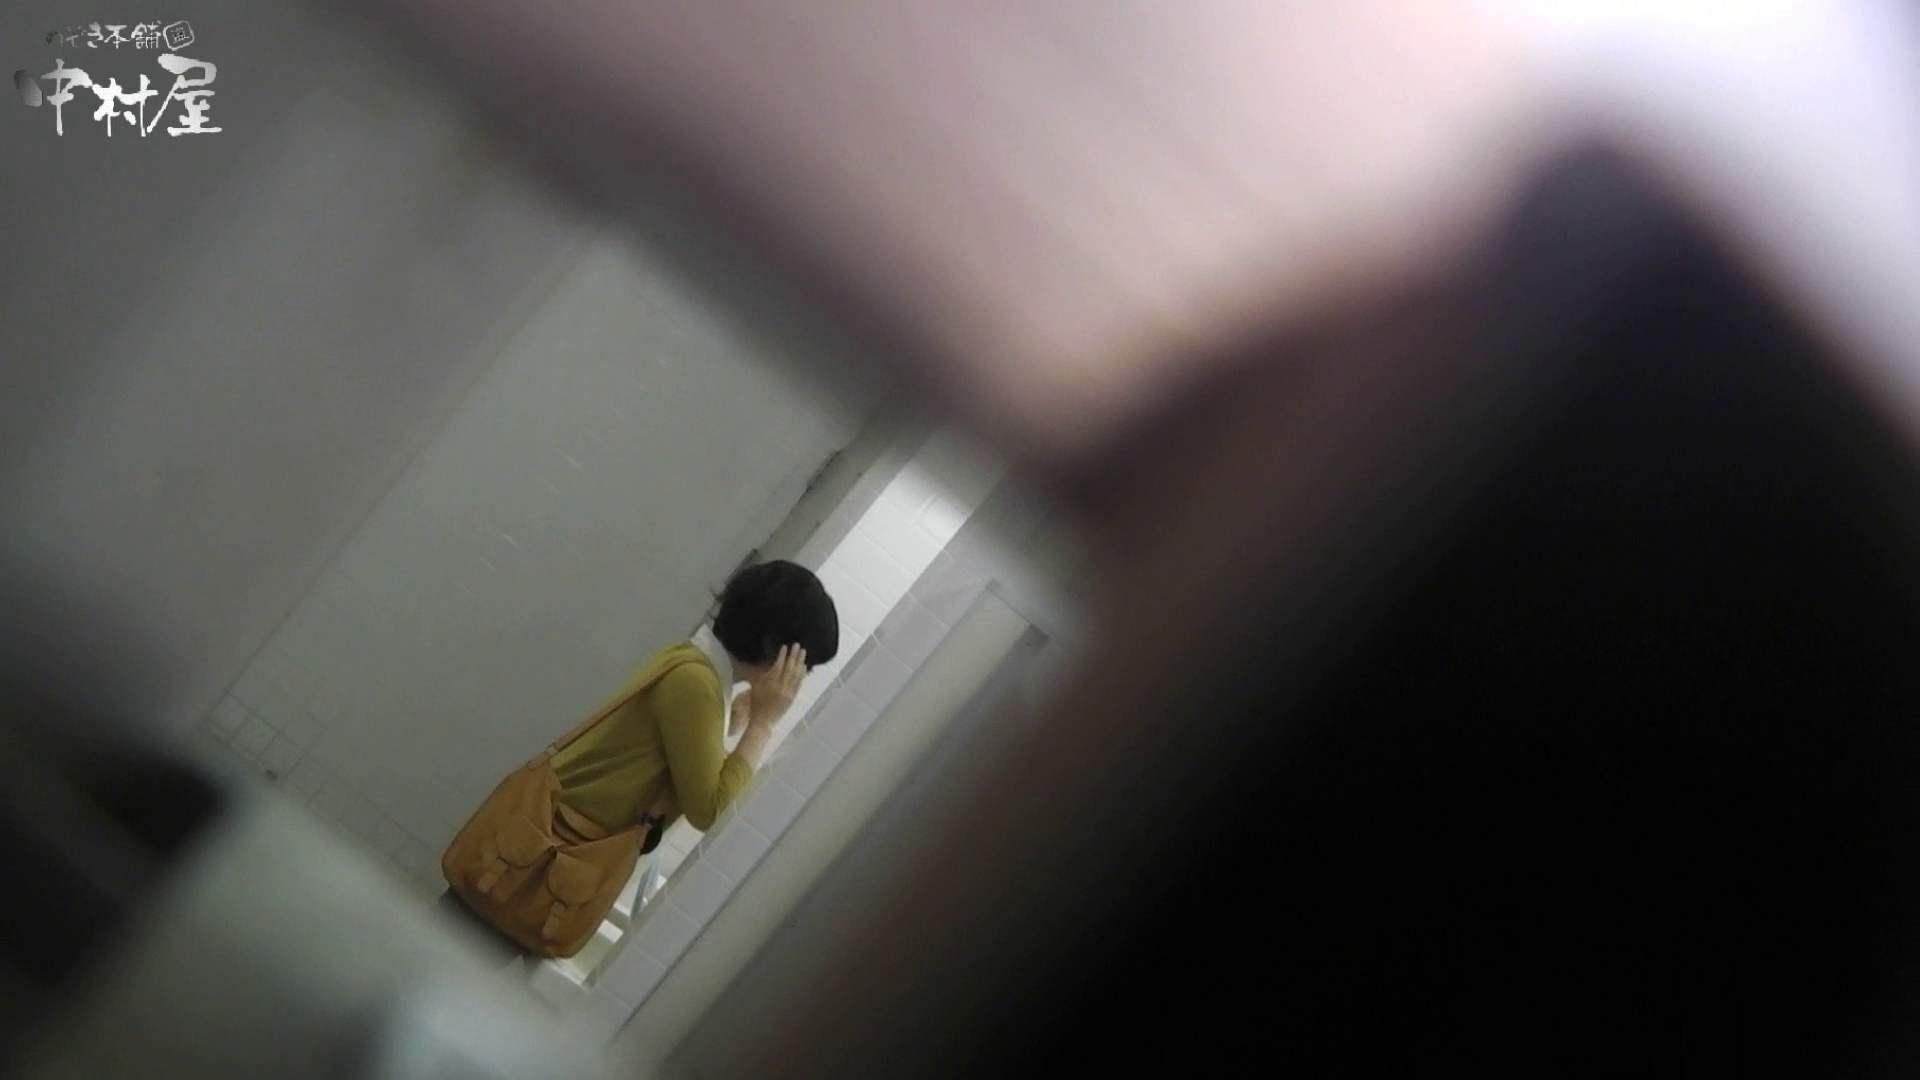 vol.54 命がけ潜伏洗面所! ヲリモノとろりん後編 プライベート  109連発 87